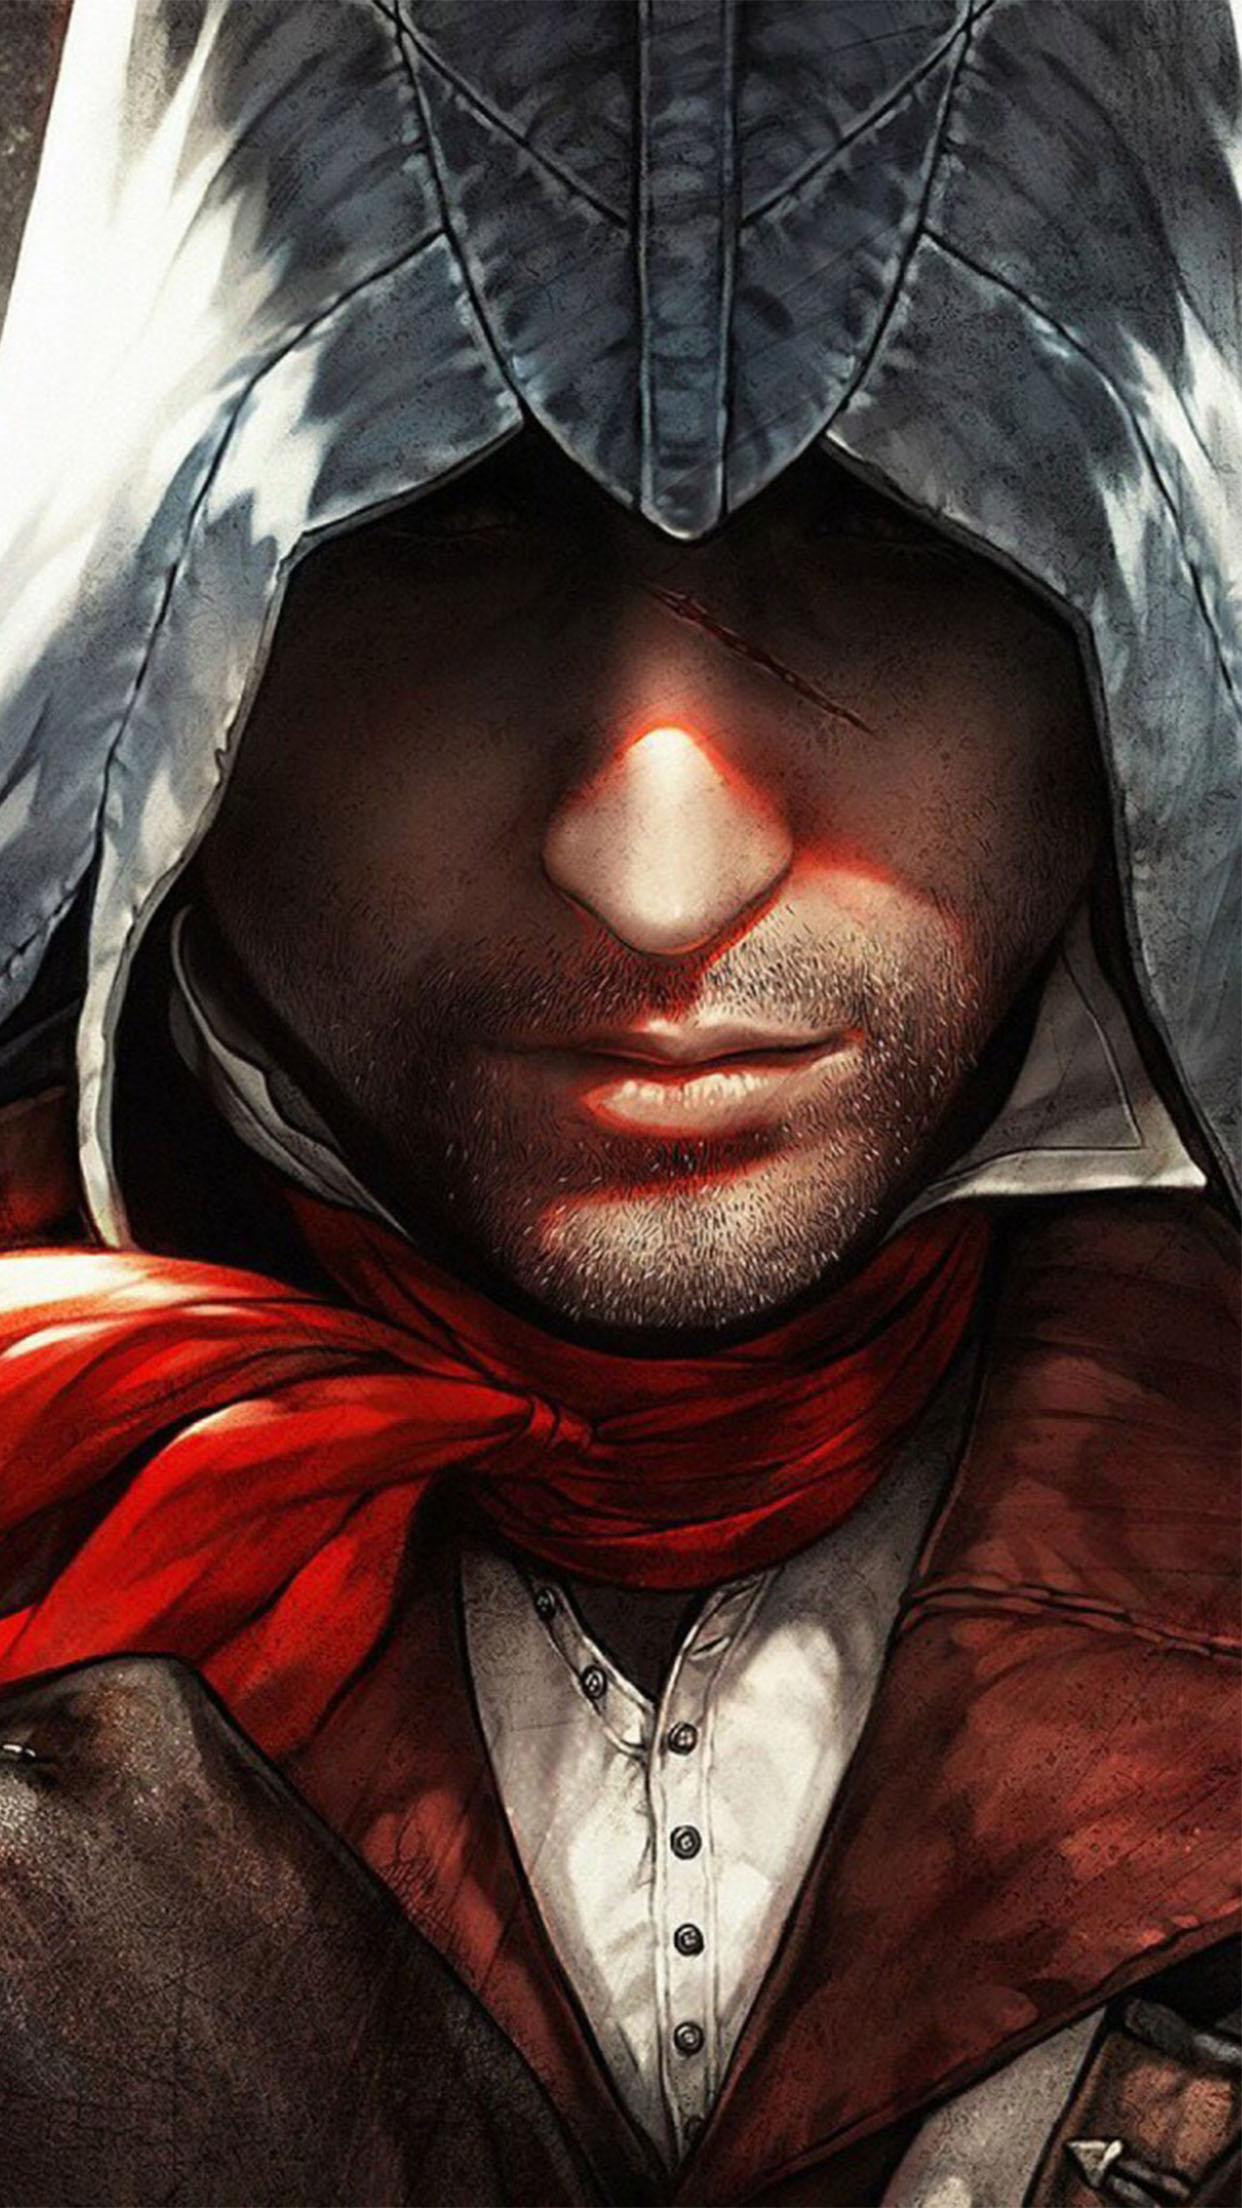 Assasins Creed Assassins Creed 2 3Wallpapers iPhone Parallax Assassins Creed 2